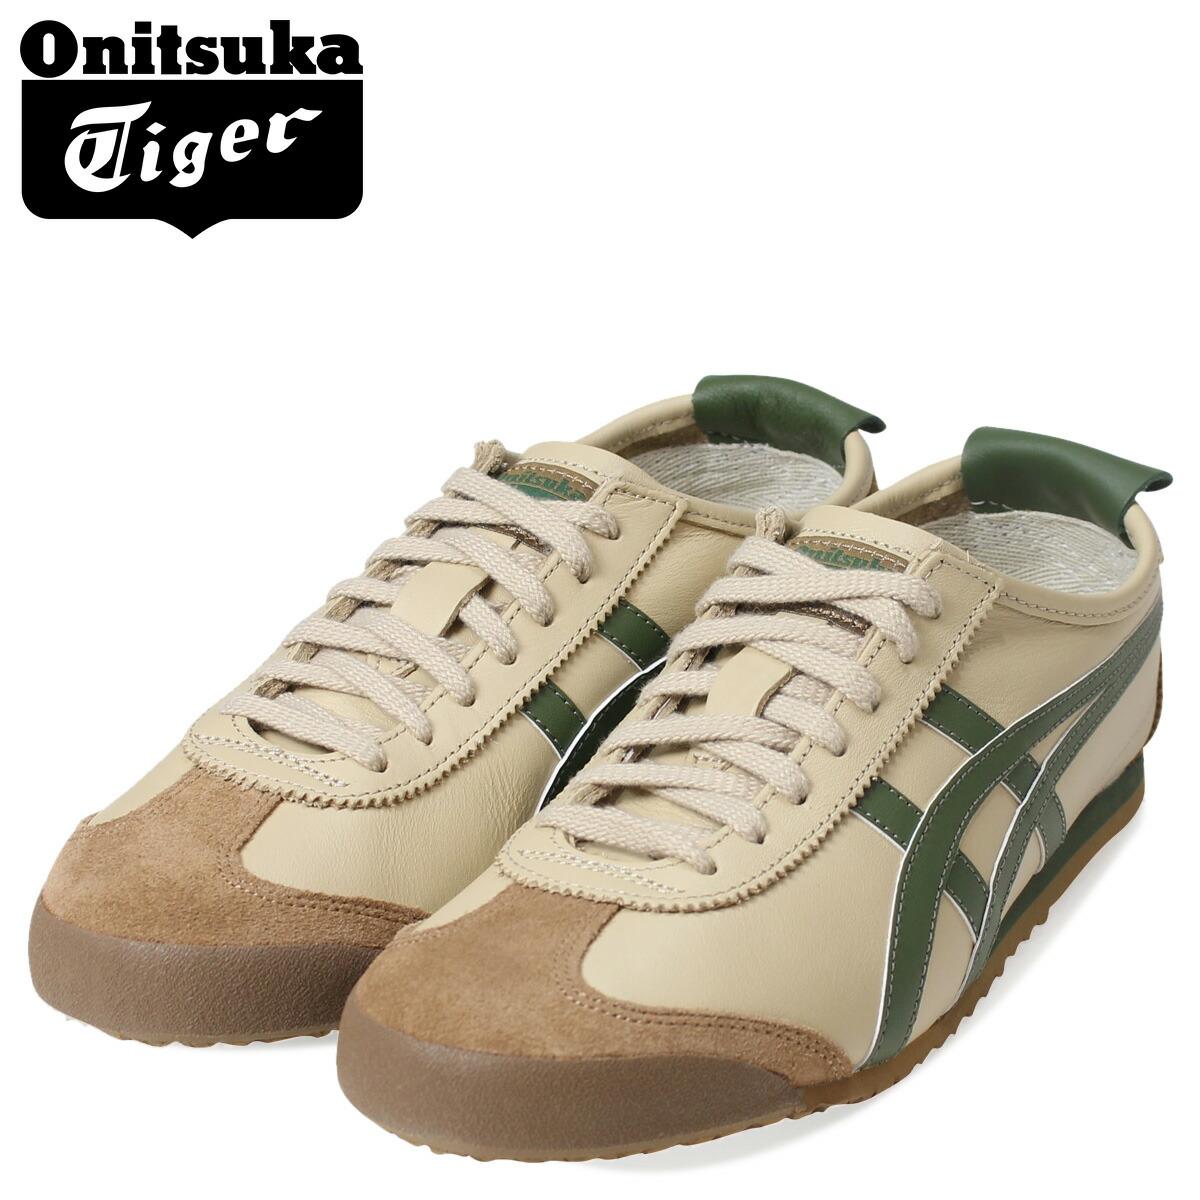 onitsuka tiger asics difference